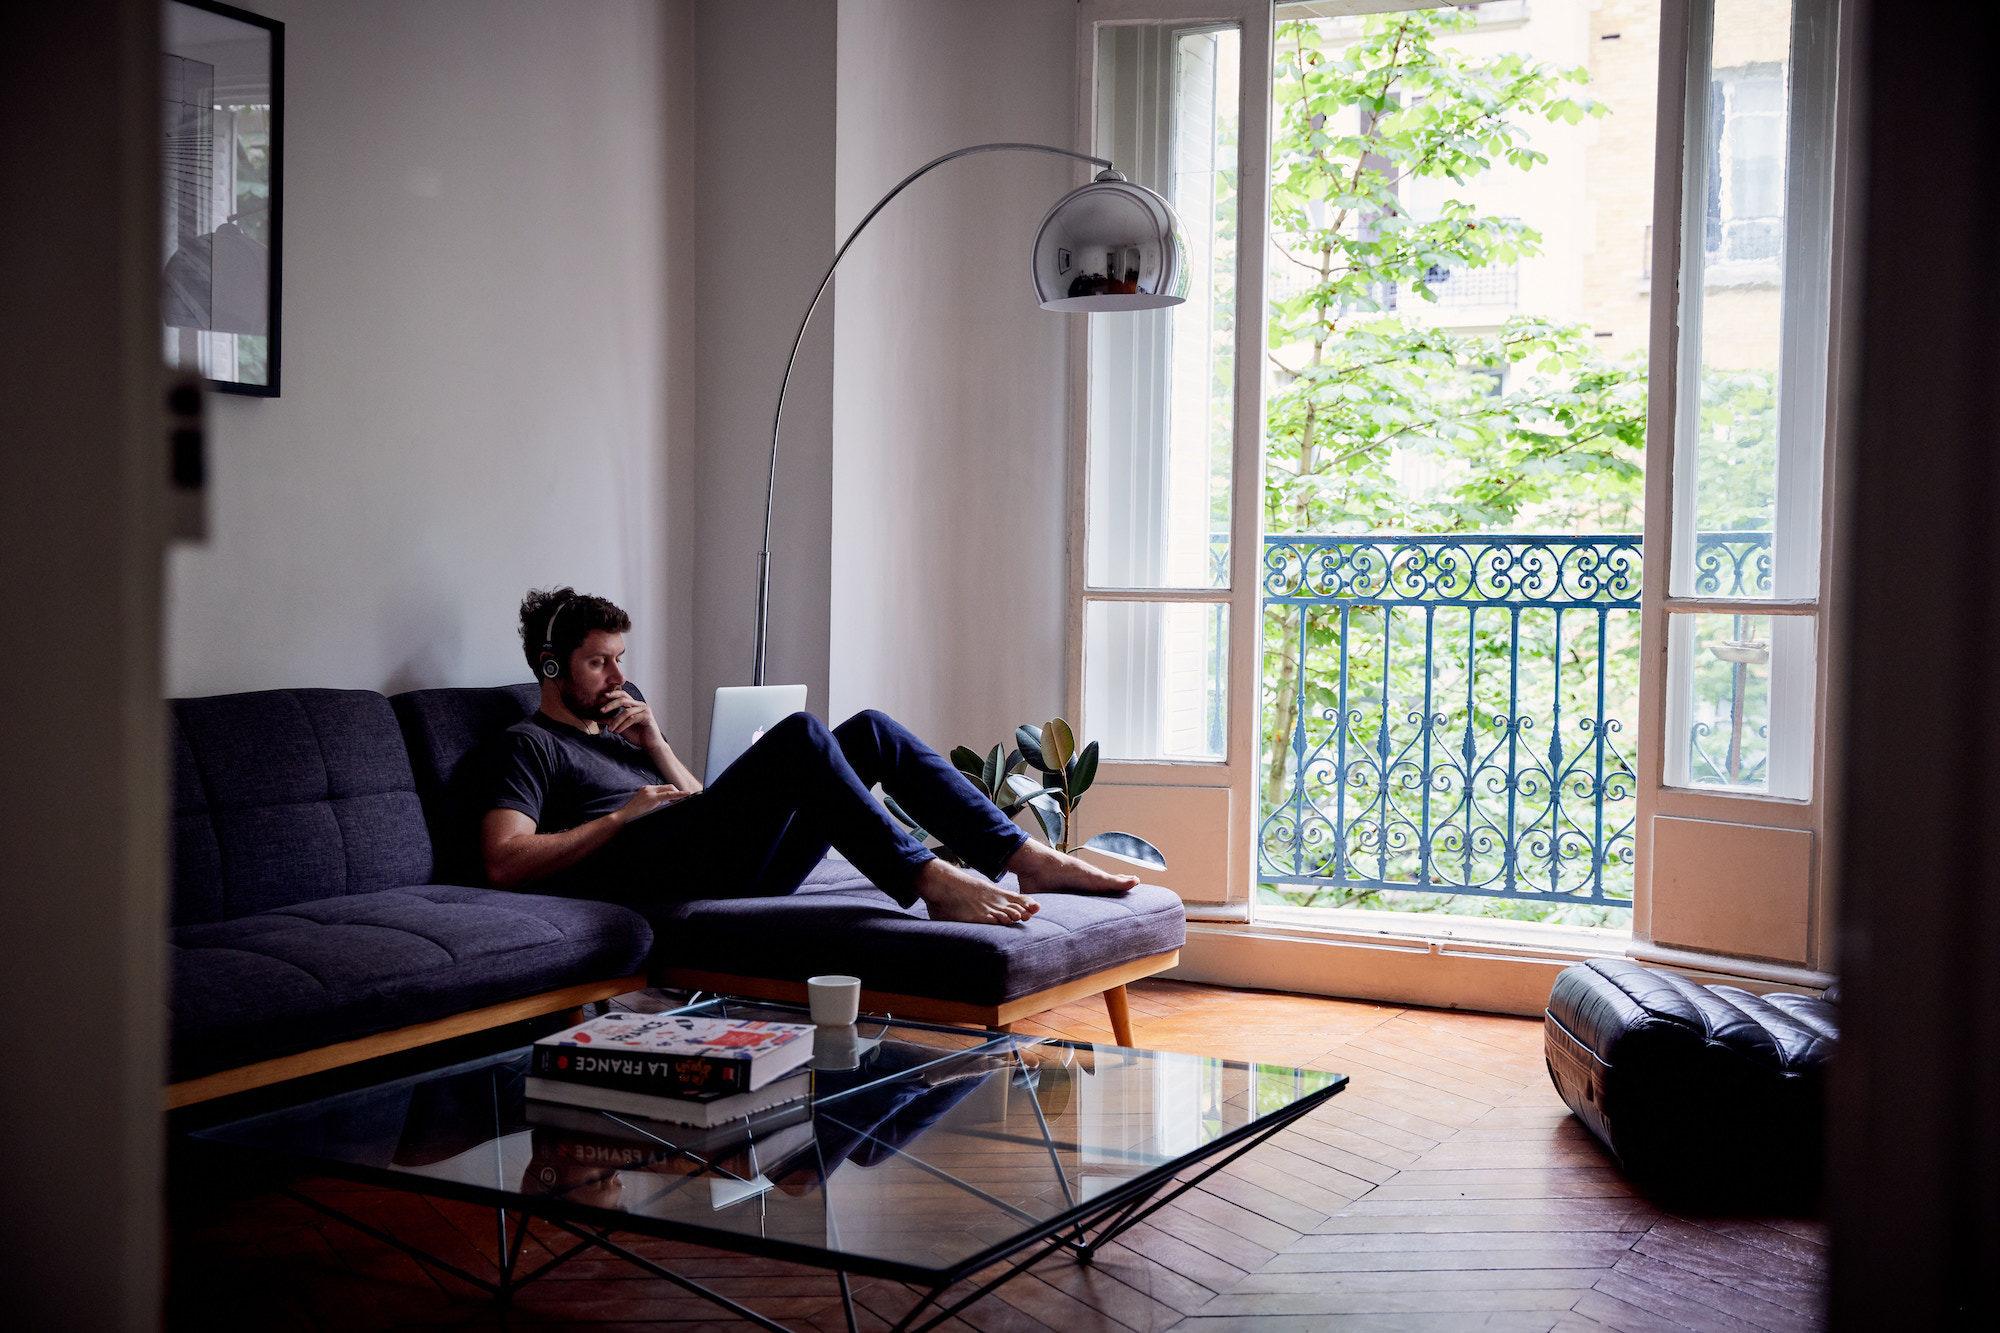 HiP Paris Blog explores living verse making a life in Paris